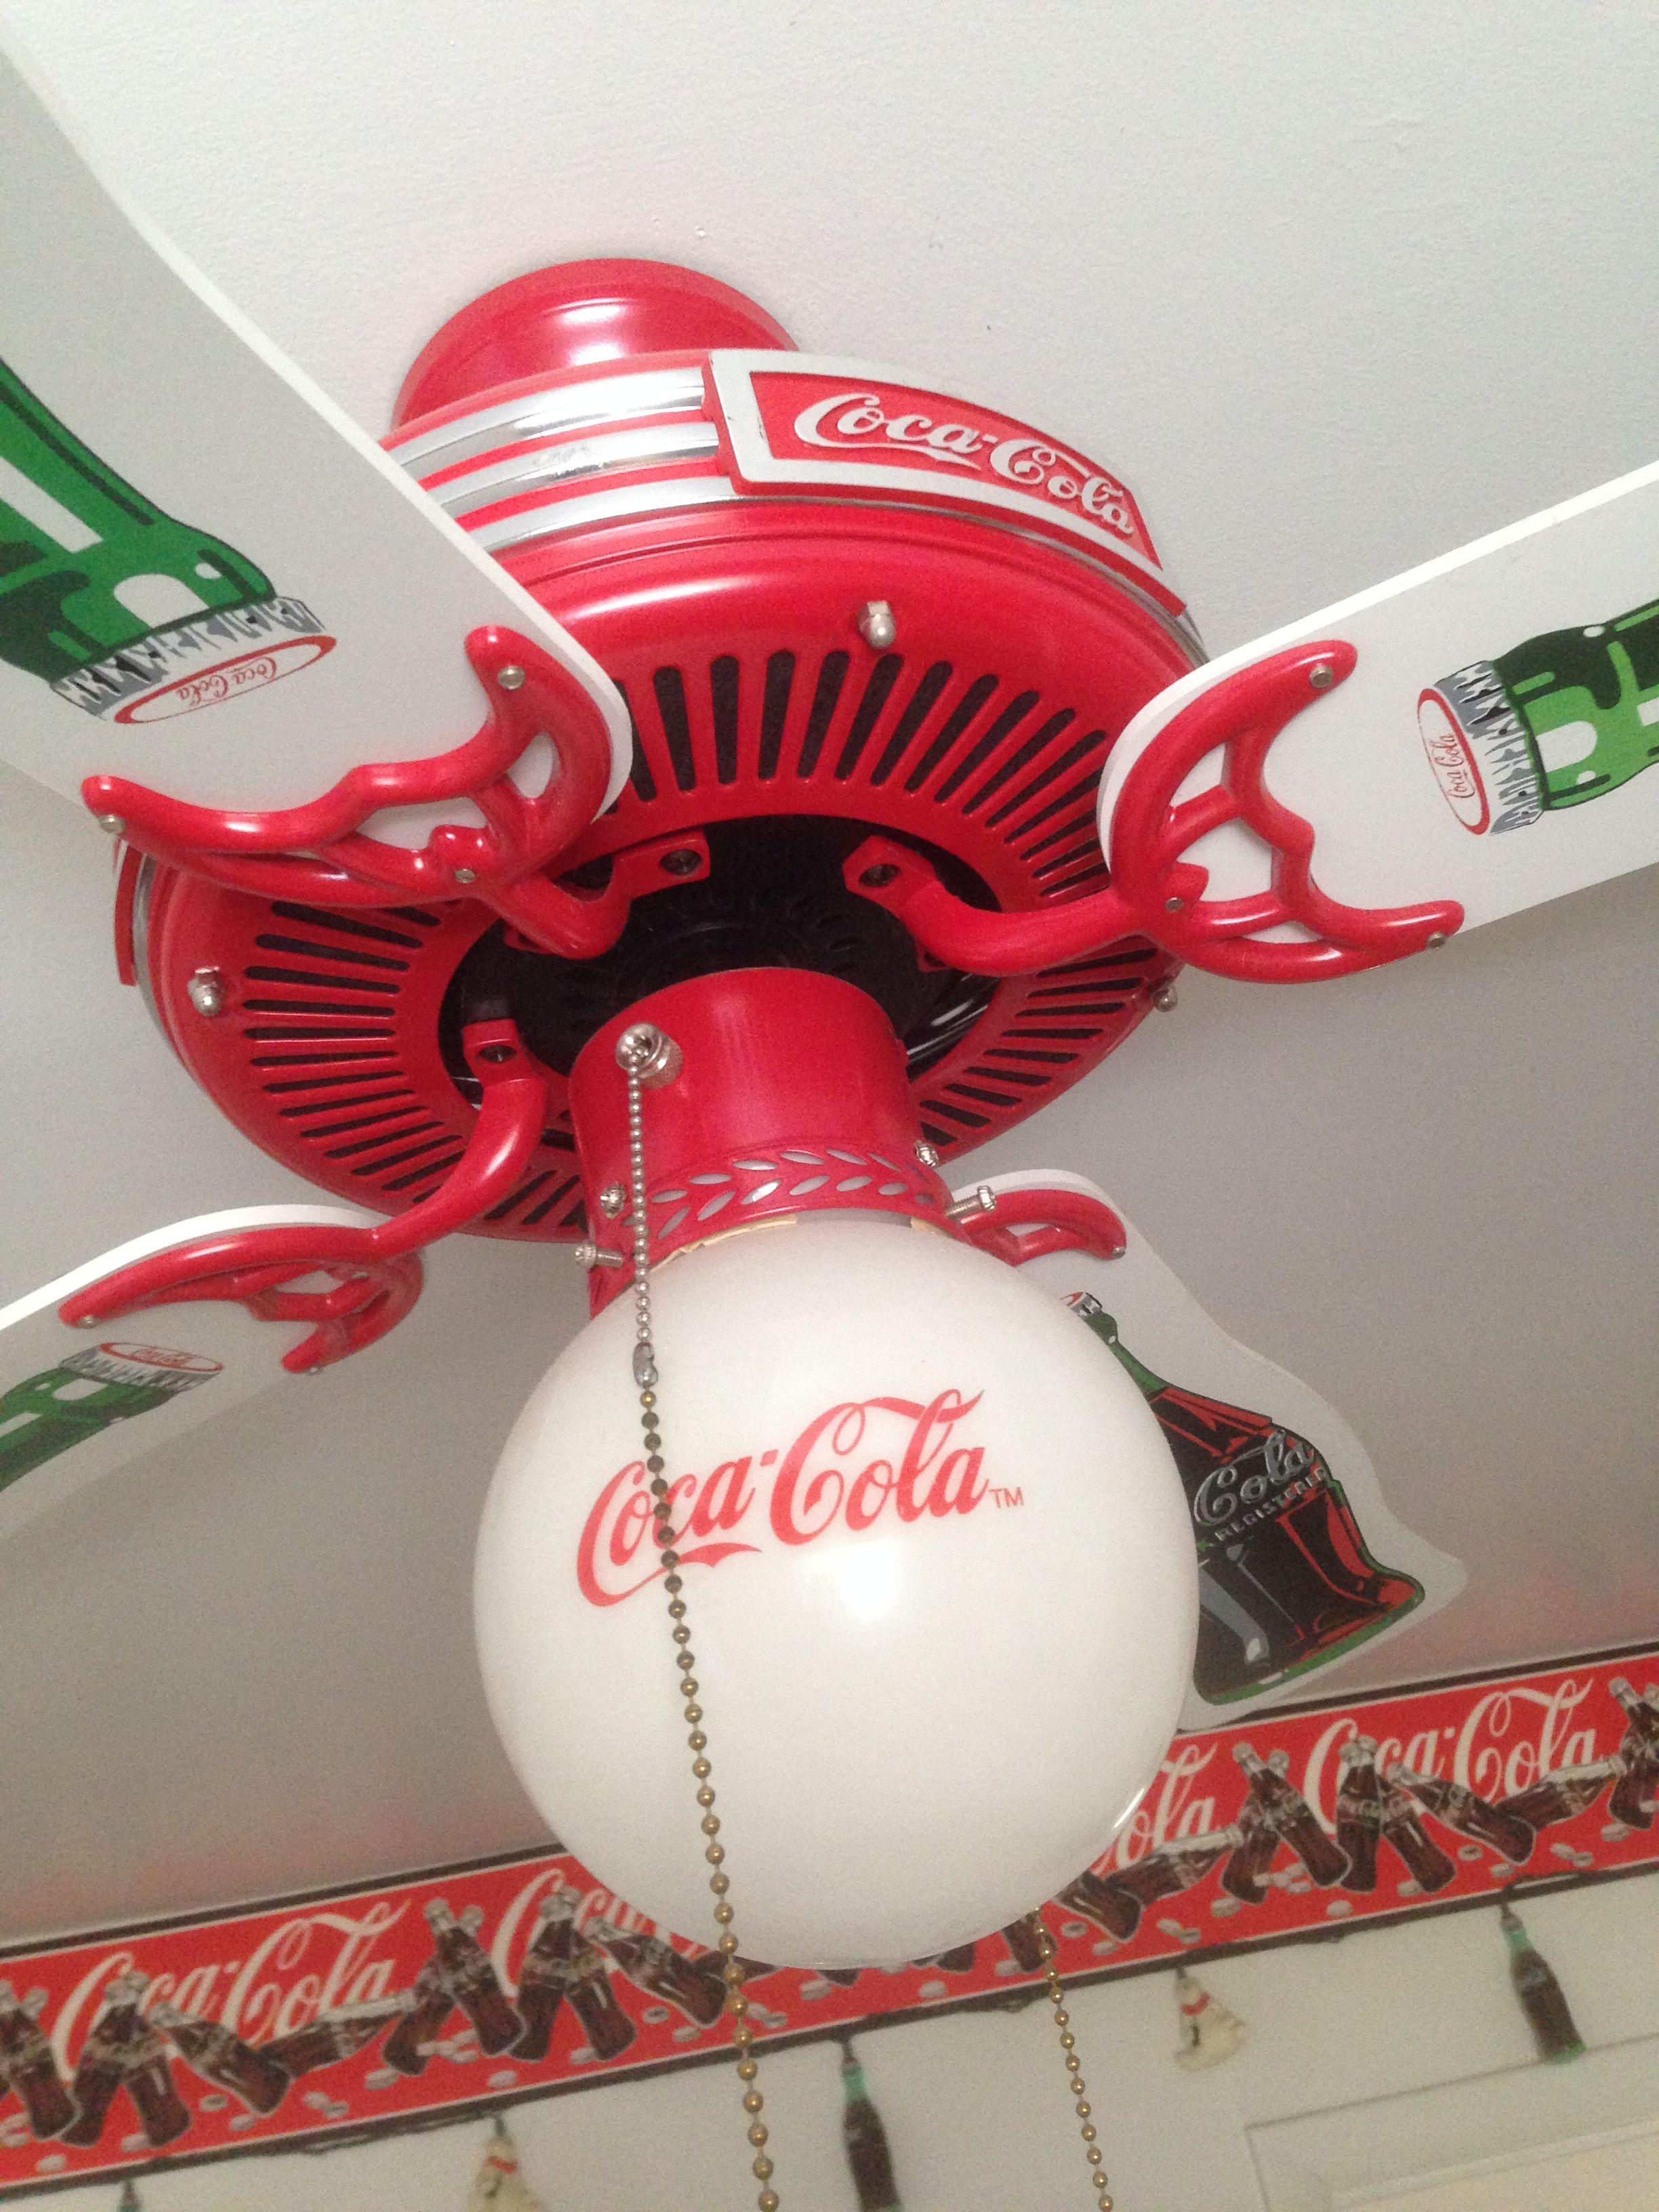 Coca cola lighted ceiling fan orins attic estate sale coca cola coca cola lighted ceiling fan orins attic estate sale aloadofball Images